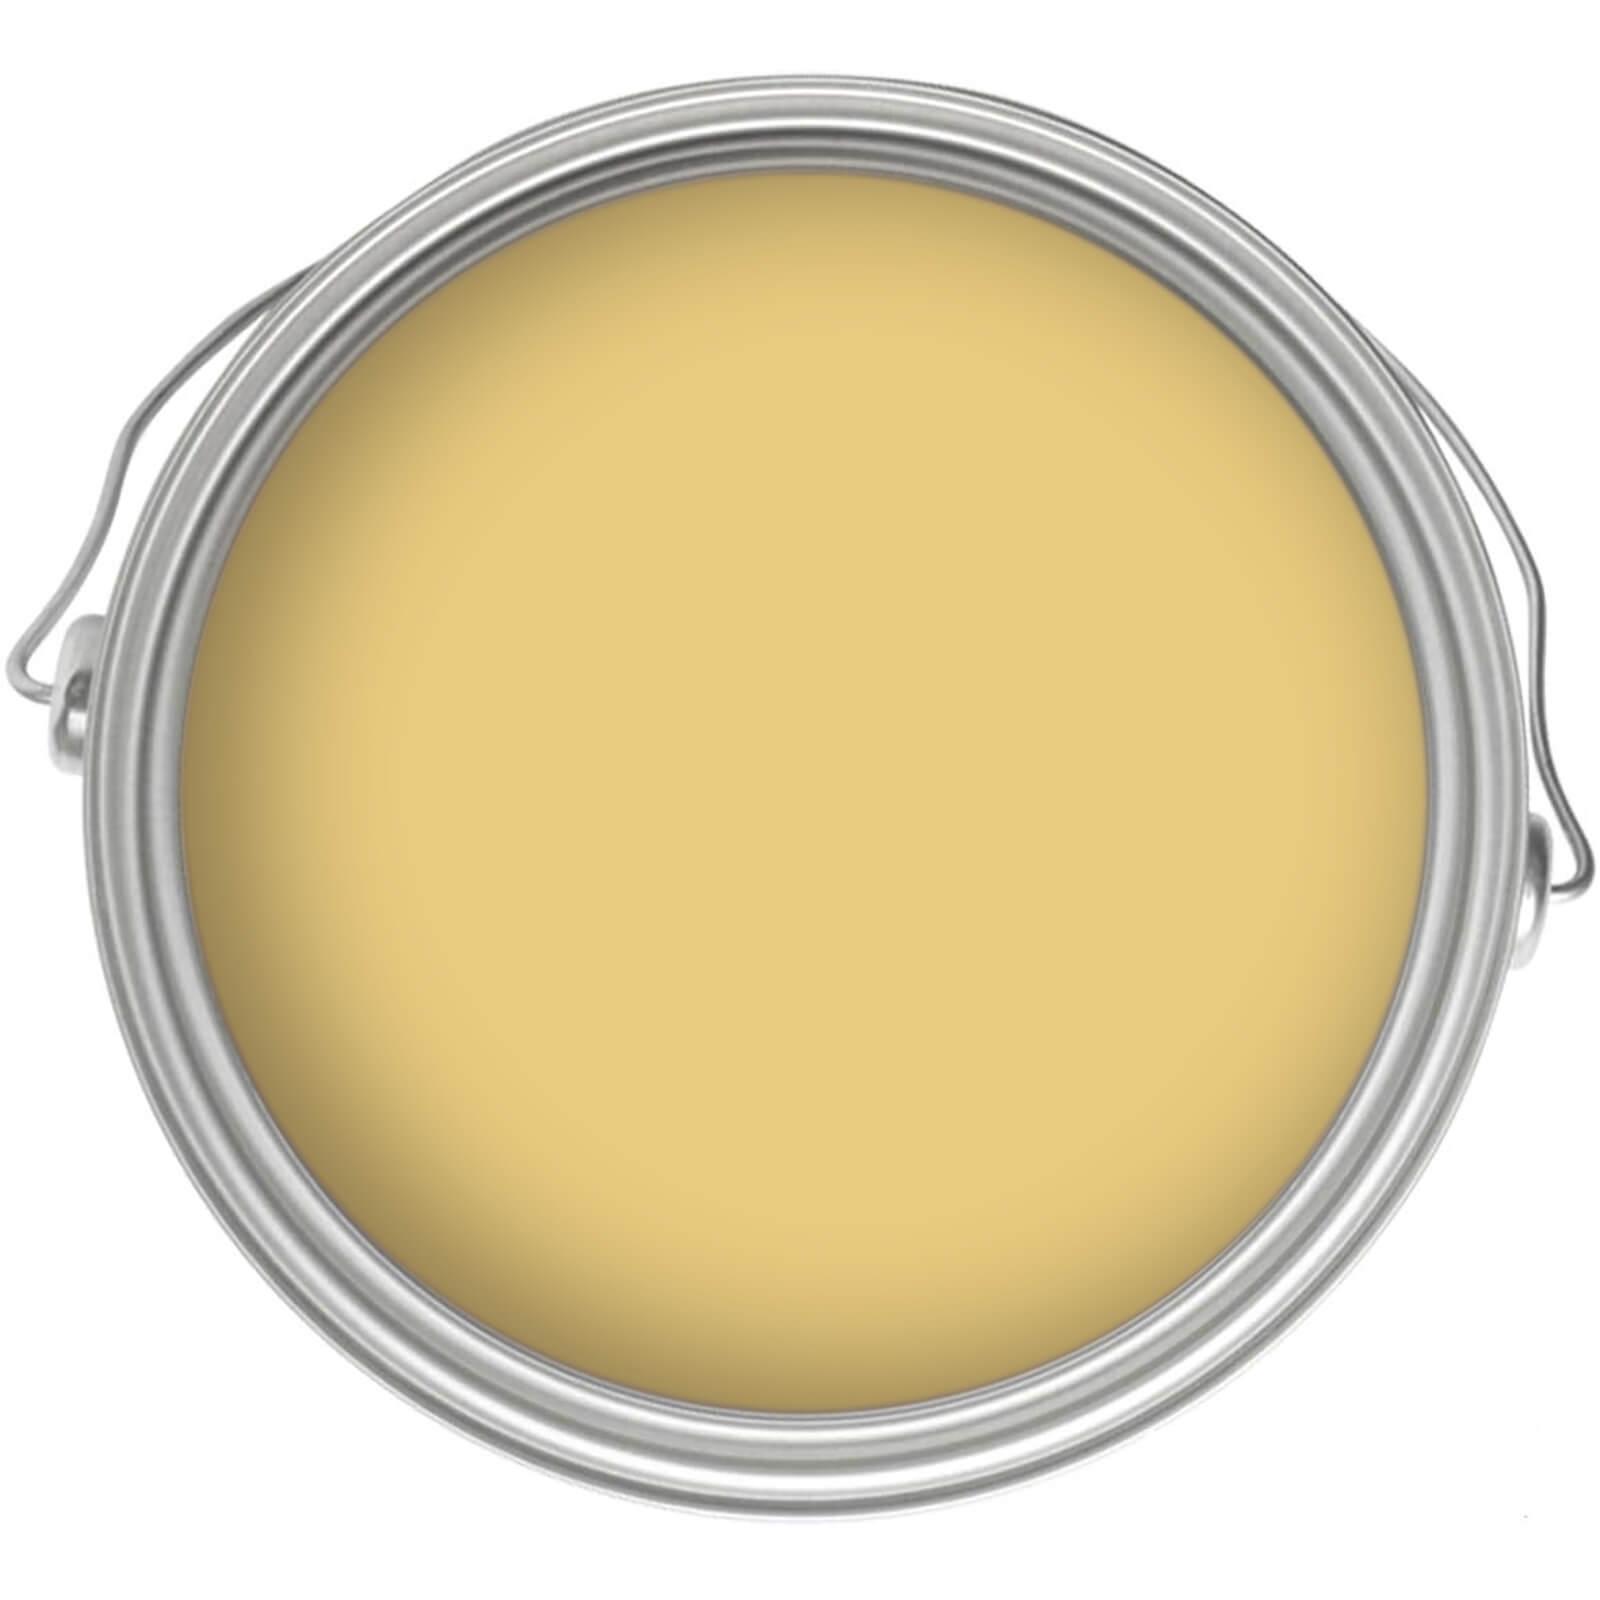 Craig & Rose 1829 Eggshell Gloriana - 2.5L